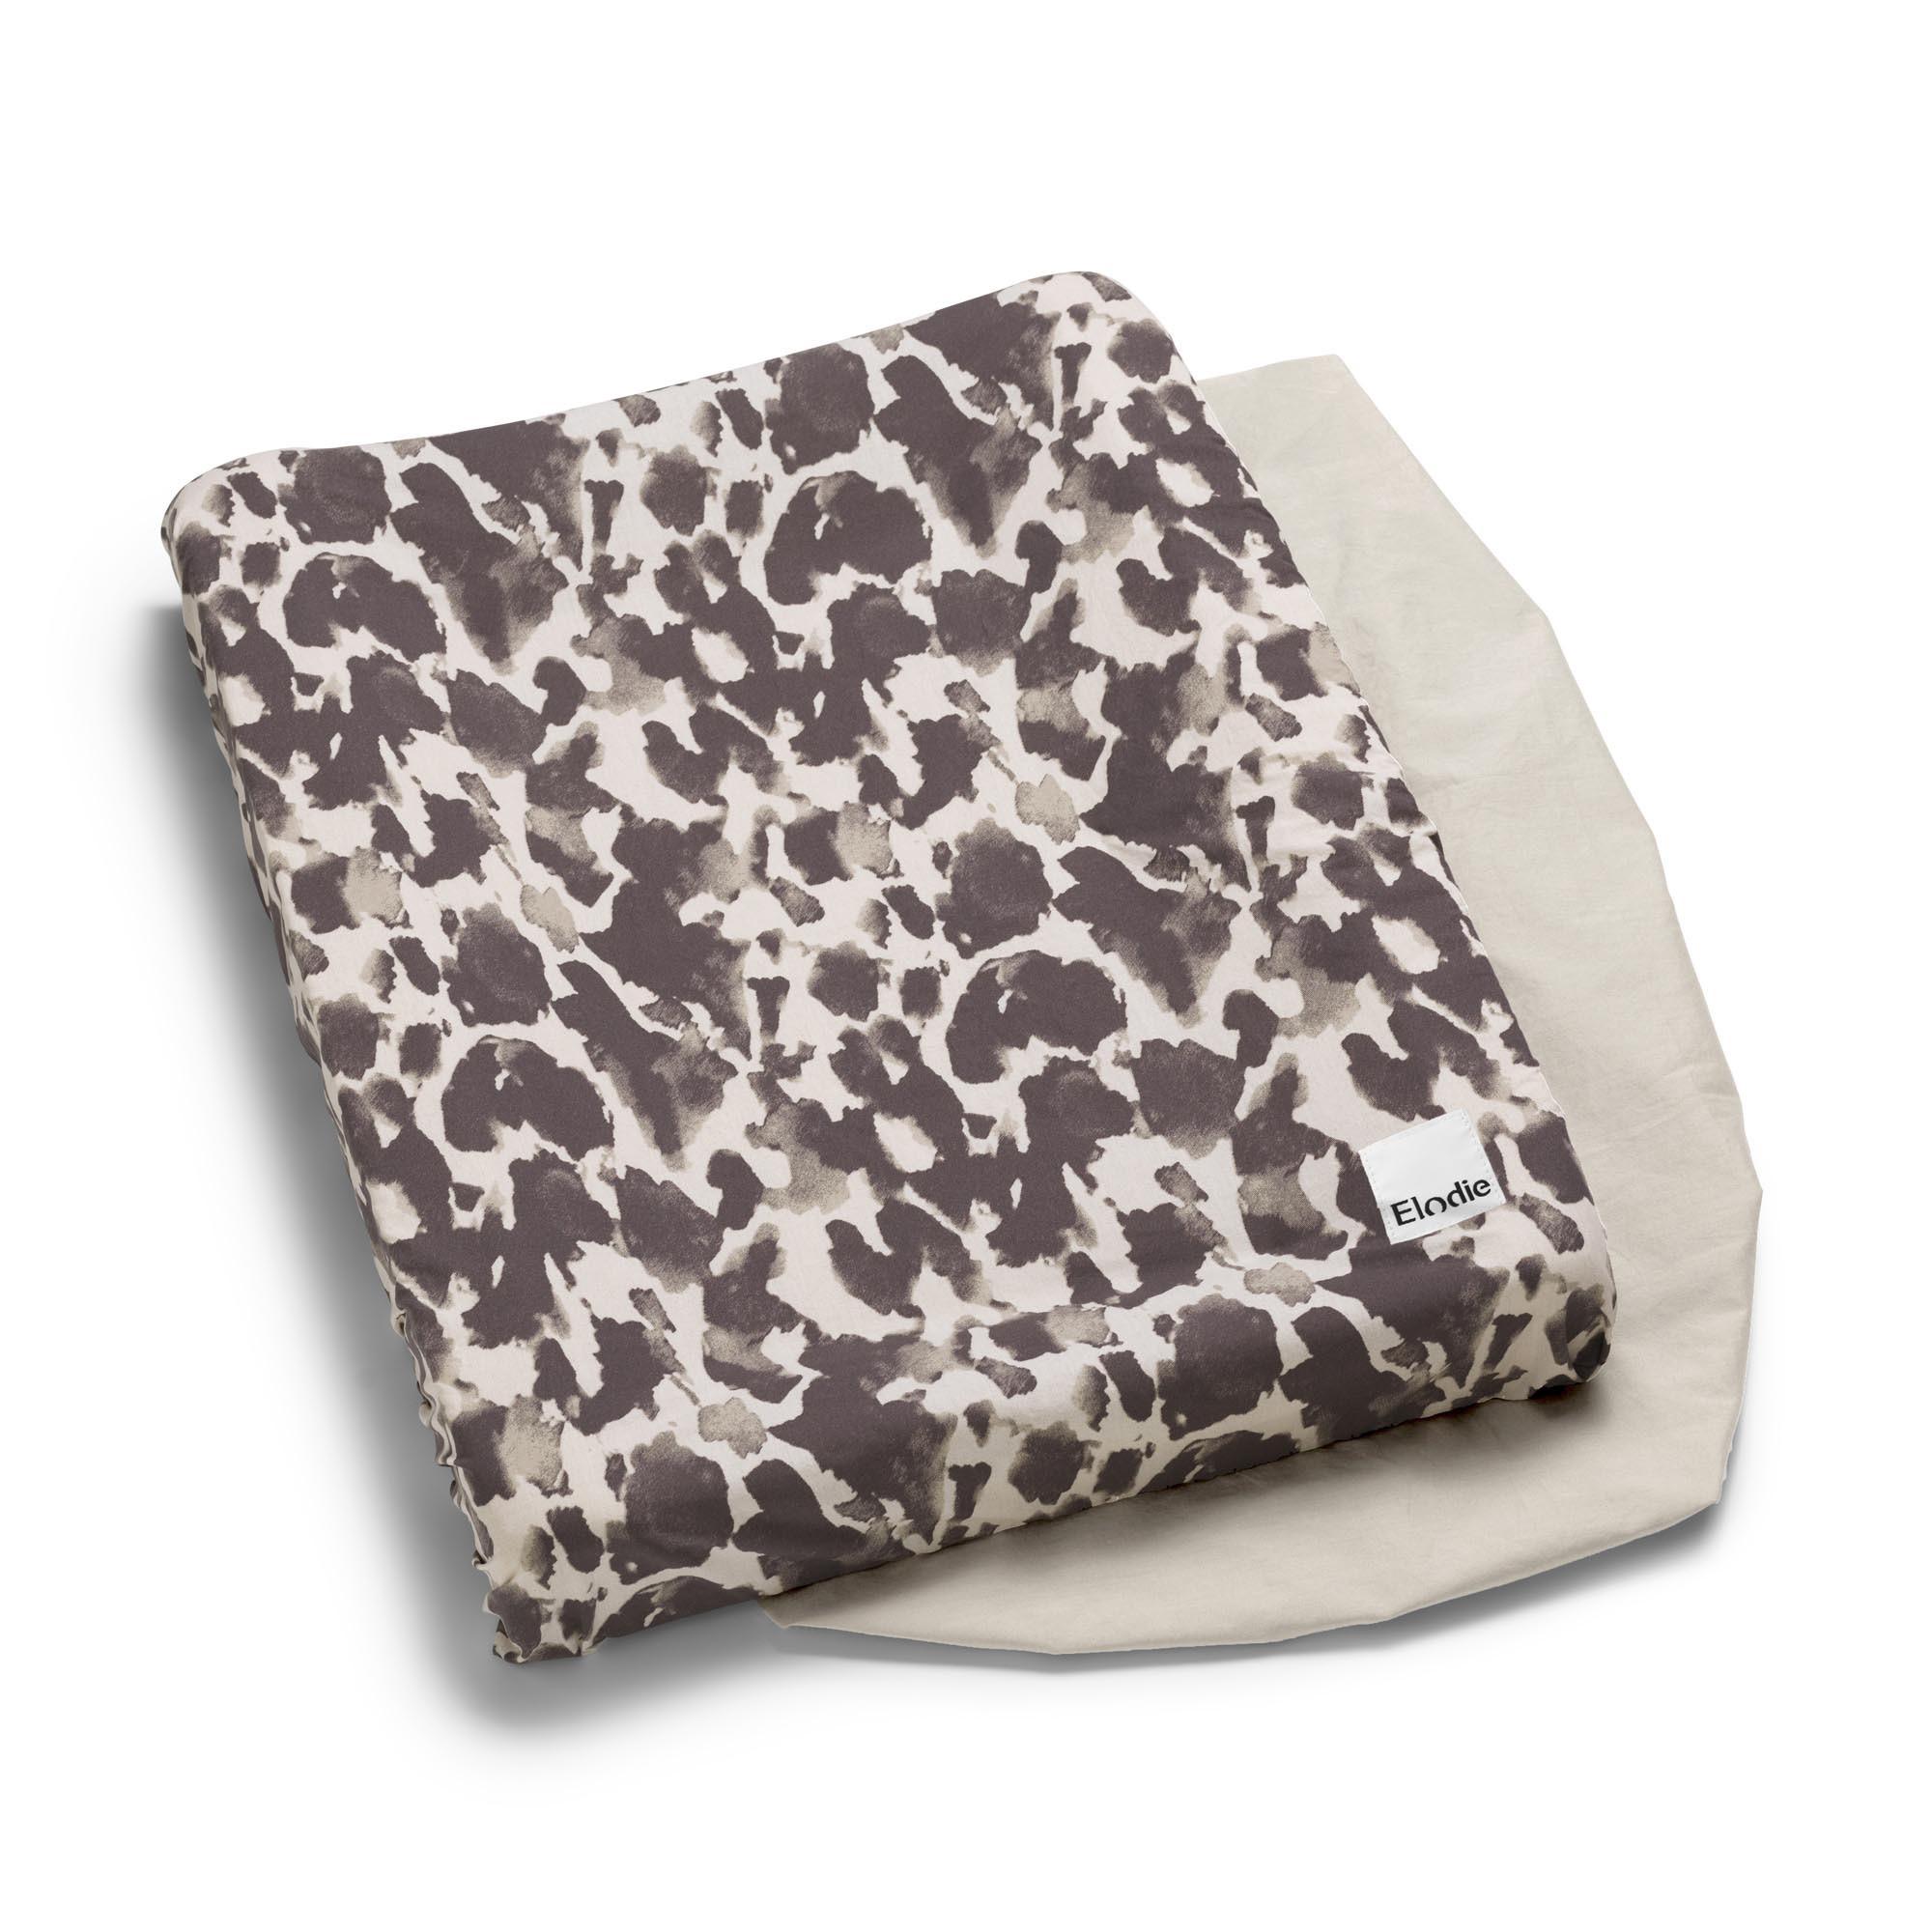 Elodie Details - Changing Pad Covers - Wild Paris